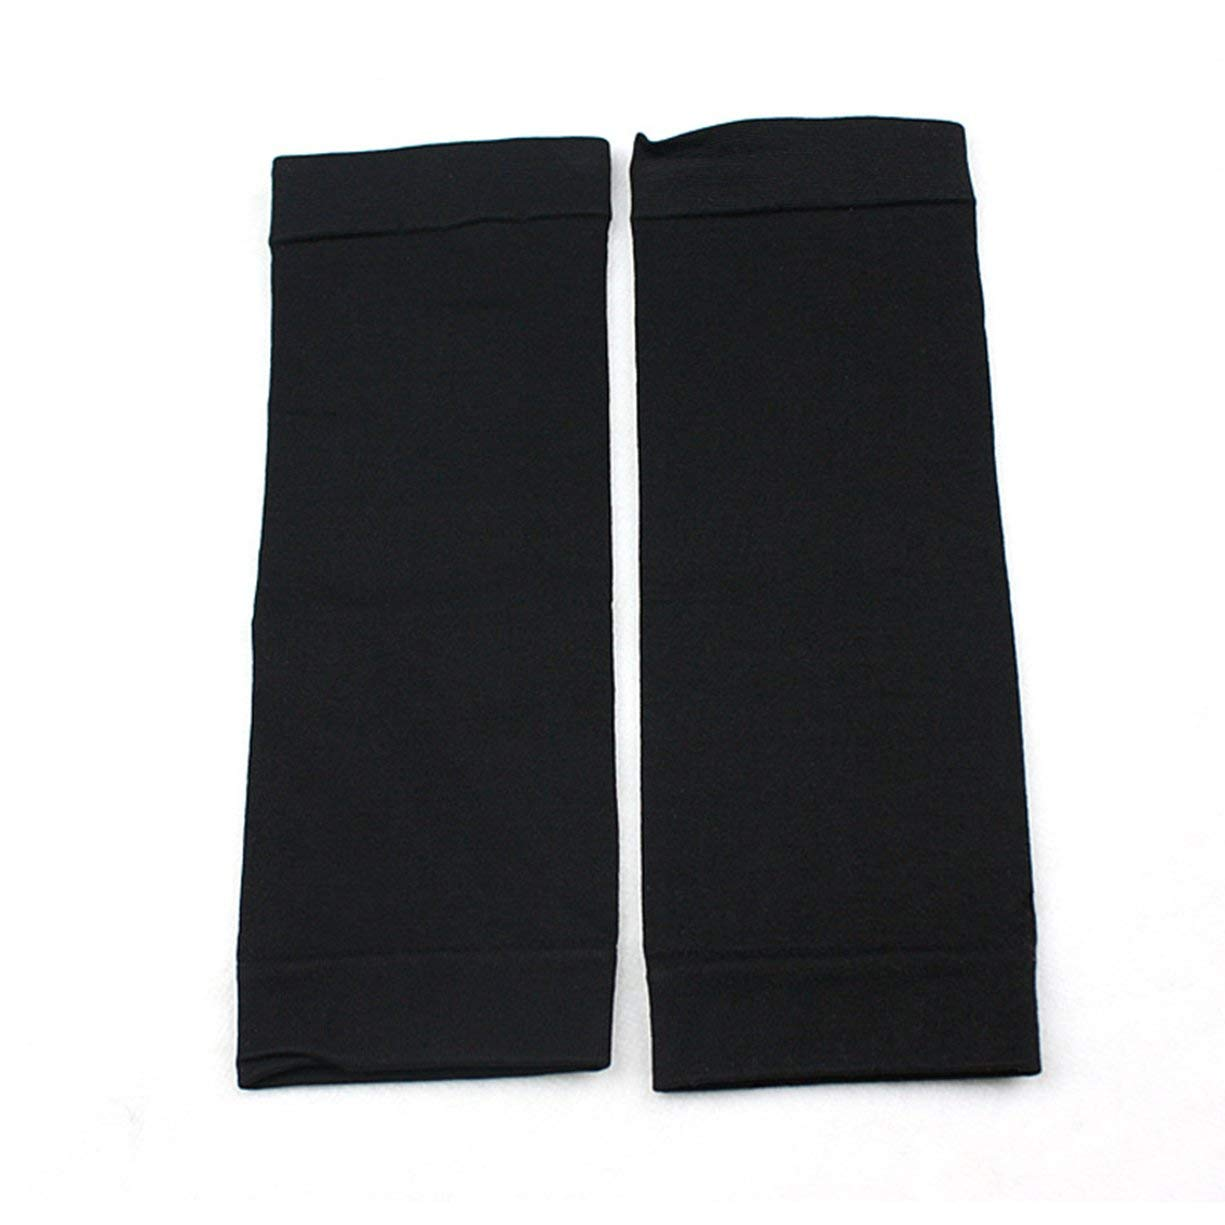 1 Pair Waist Cinchers Thigh Burn Fat Socks Compression Leggings Leg Warmers Pressure Fat Thin Leg Pants Burning Fat Guard Detectoy